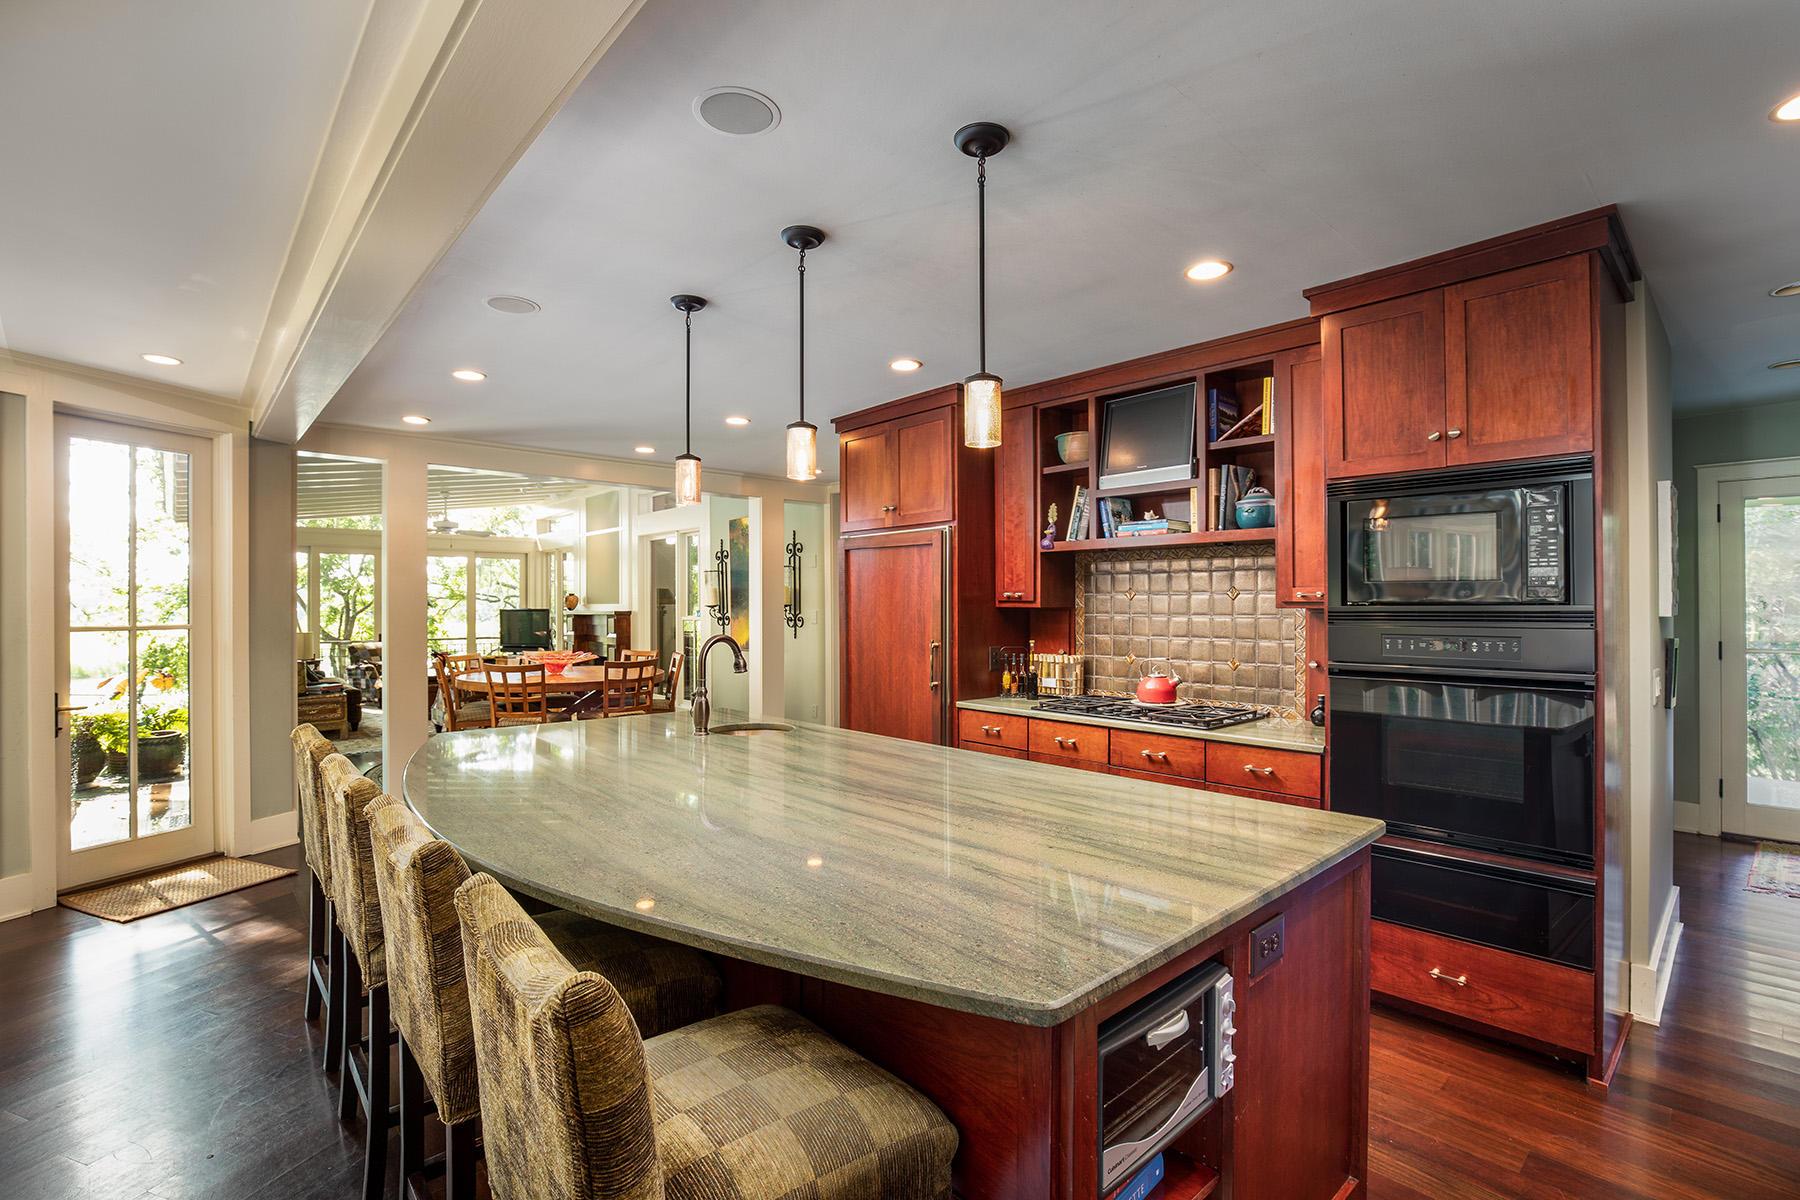 Ellis Oaks Homes For Sale - 672 Ellis Oak, Charleston, SC - 10